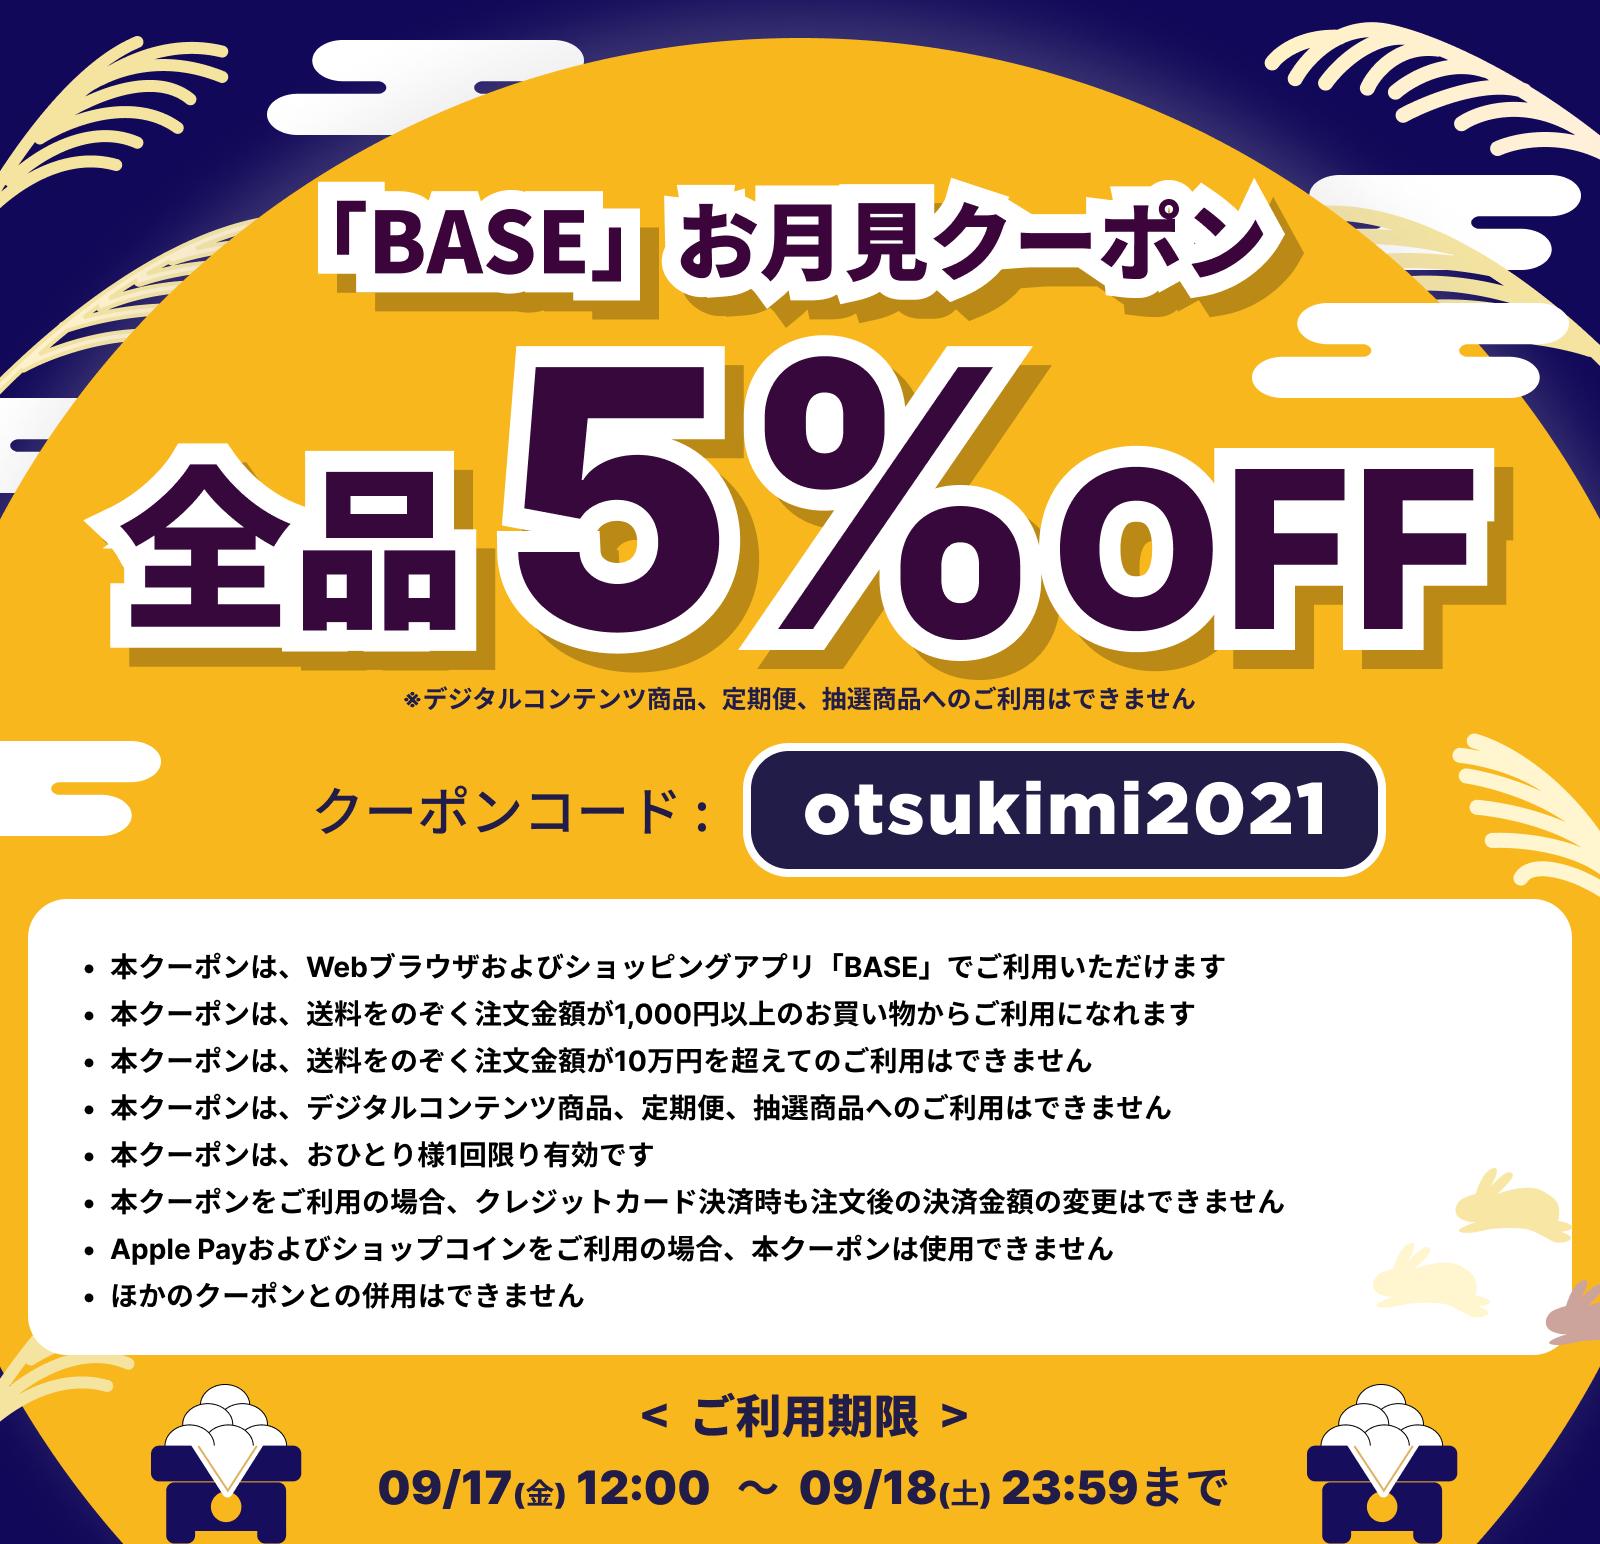 「BASE」お月見クーポンキャンペーン!